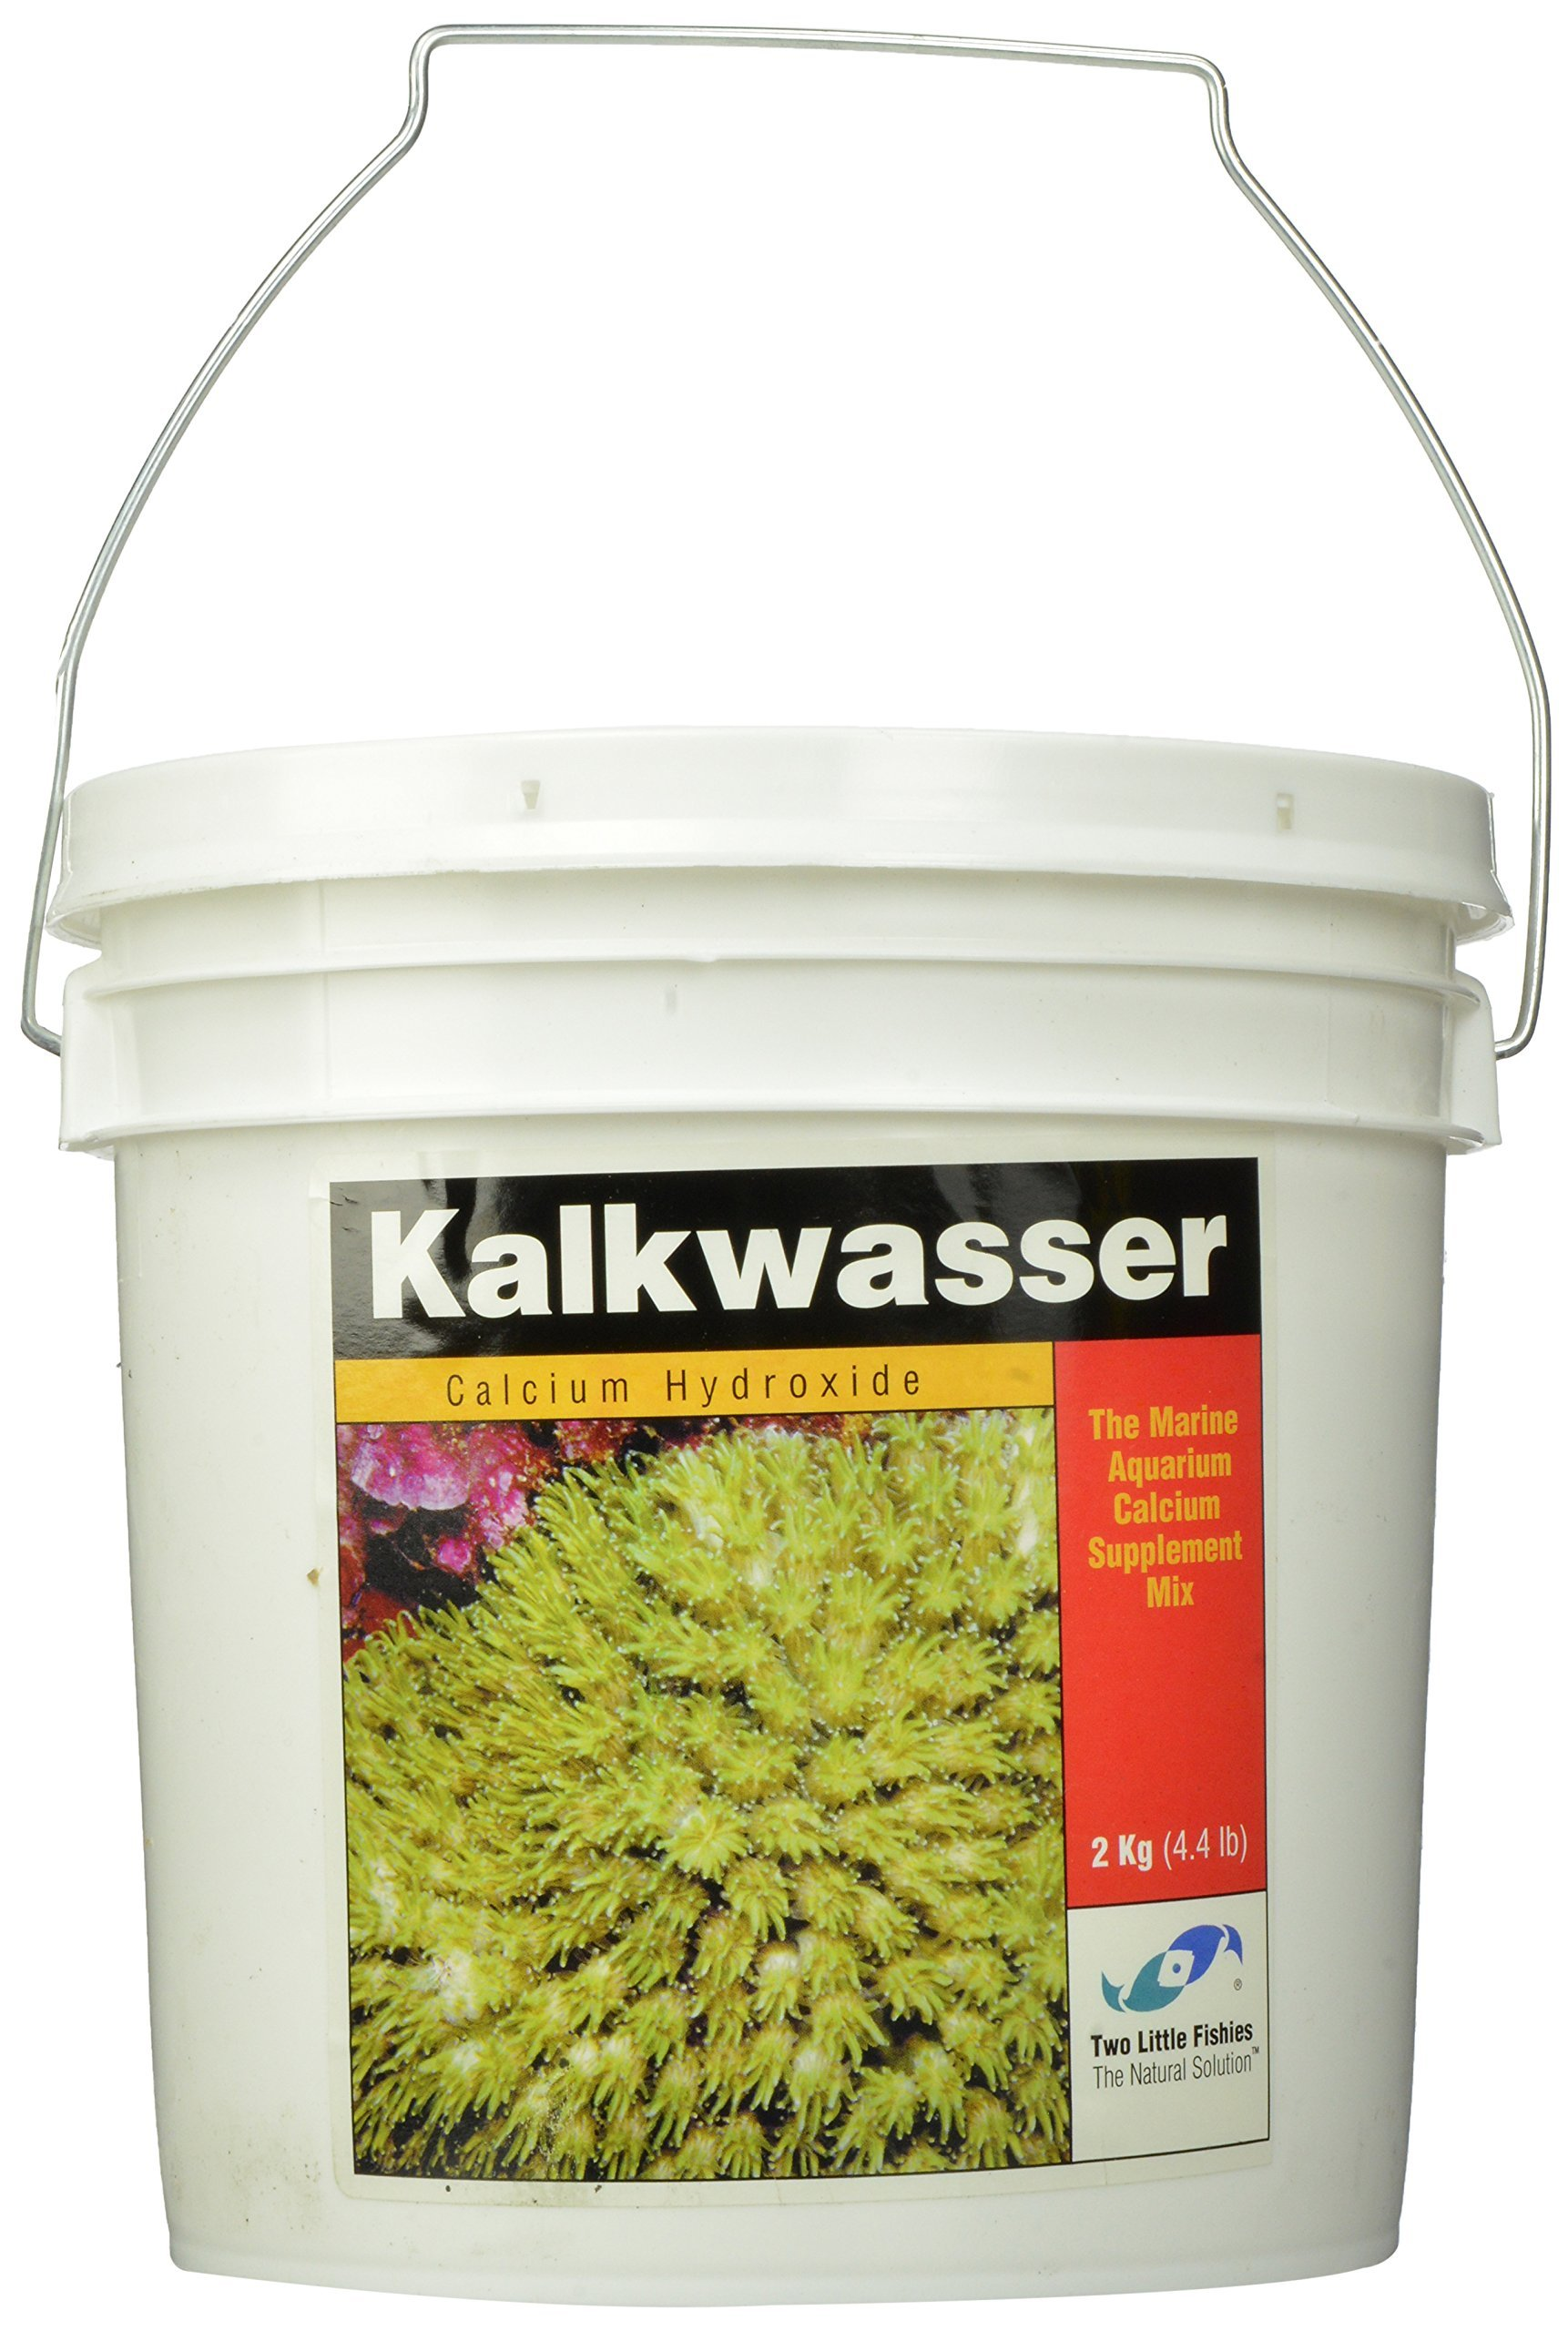 Two Little Fishies Kalkwasser Calcium Supplement for Aquarium, 2kg by Two Little Fishies